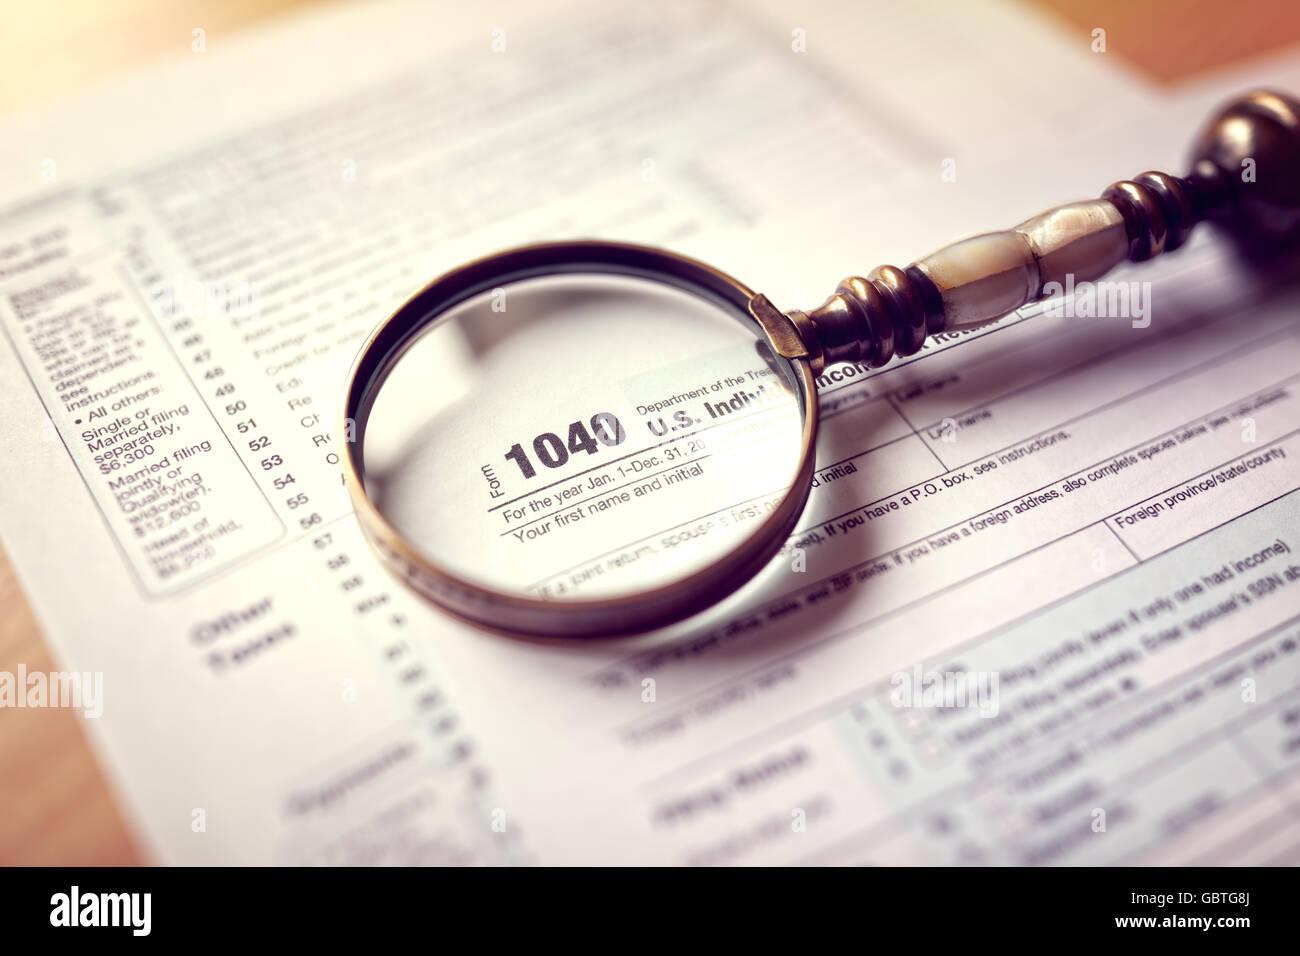 1040 tax return form choice image standard form examples income tax 1040 us individual tax return form and magnifying glass income tax 1040 us individual falaconquin